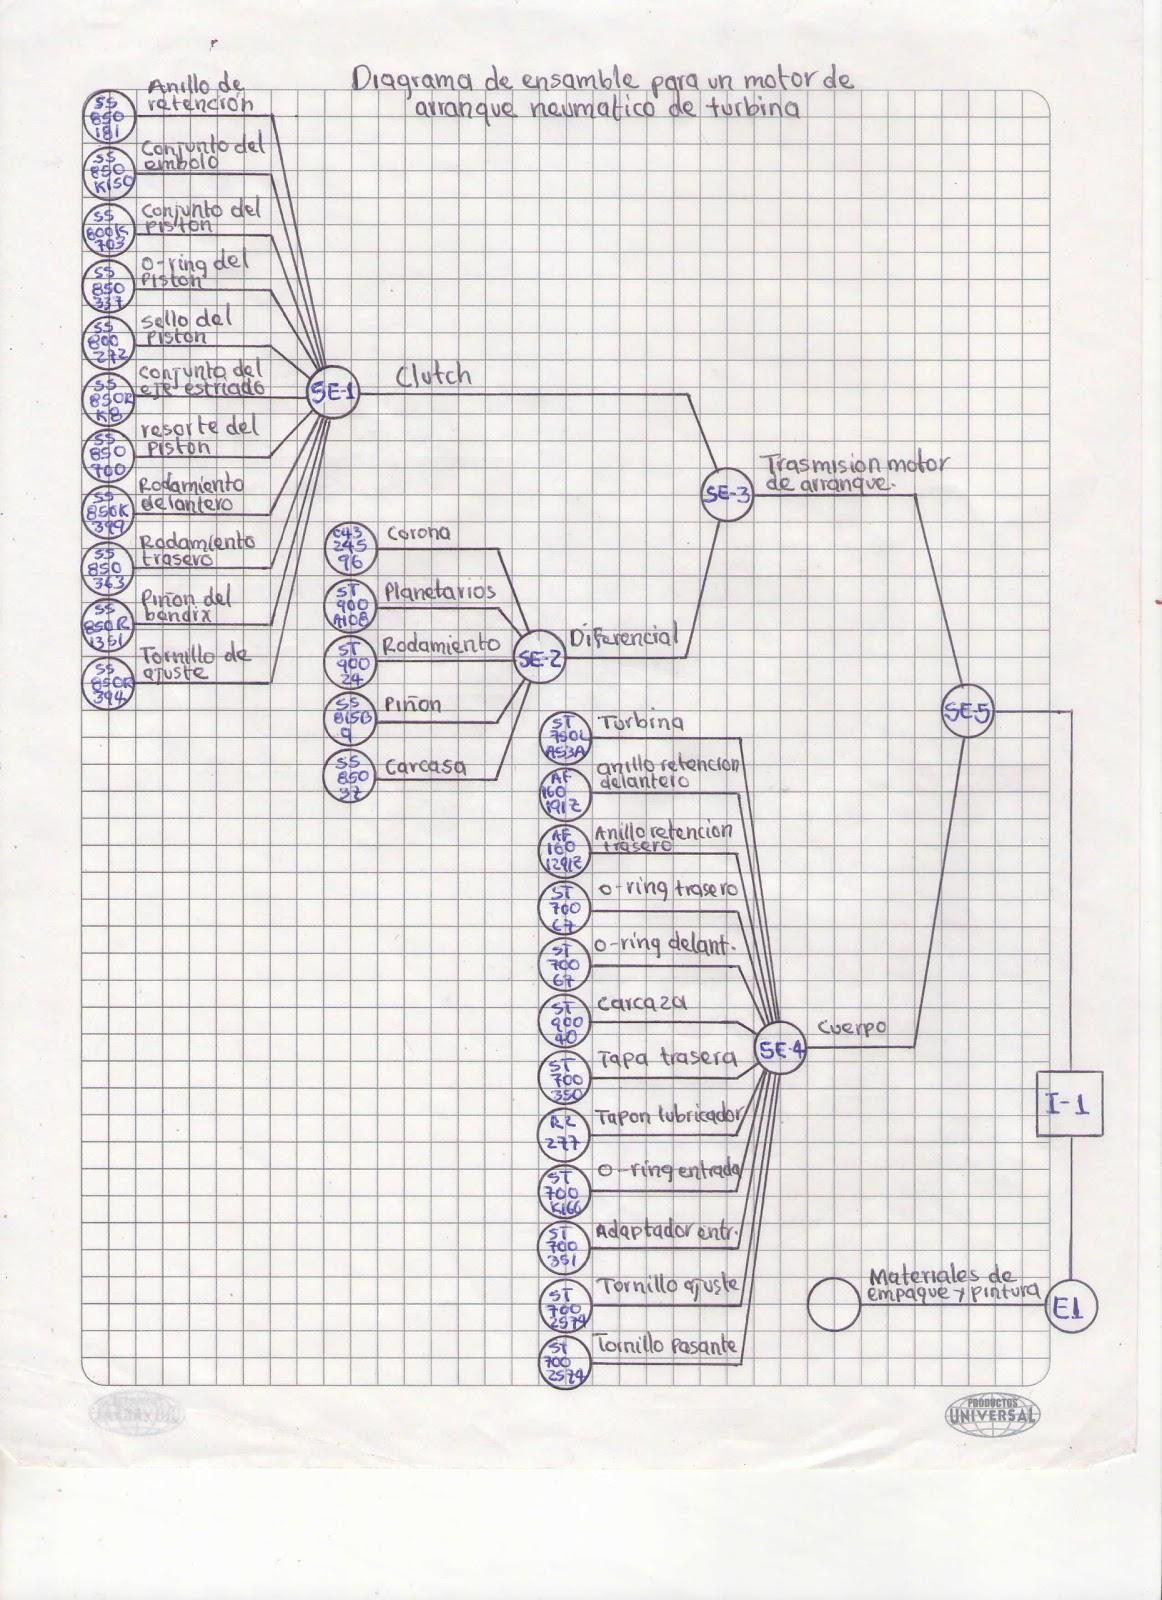 Distribucion De Planta  Diagramas De Ensamble